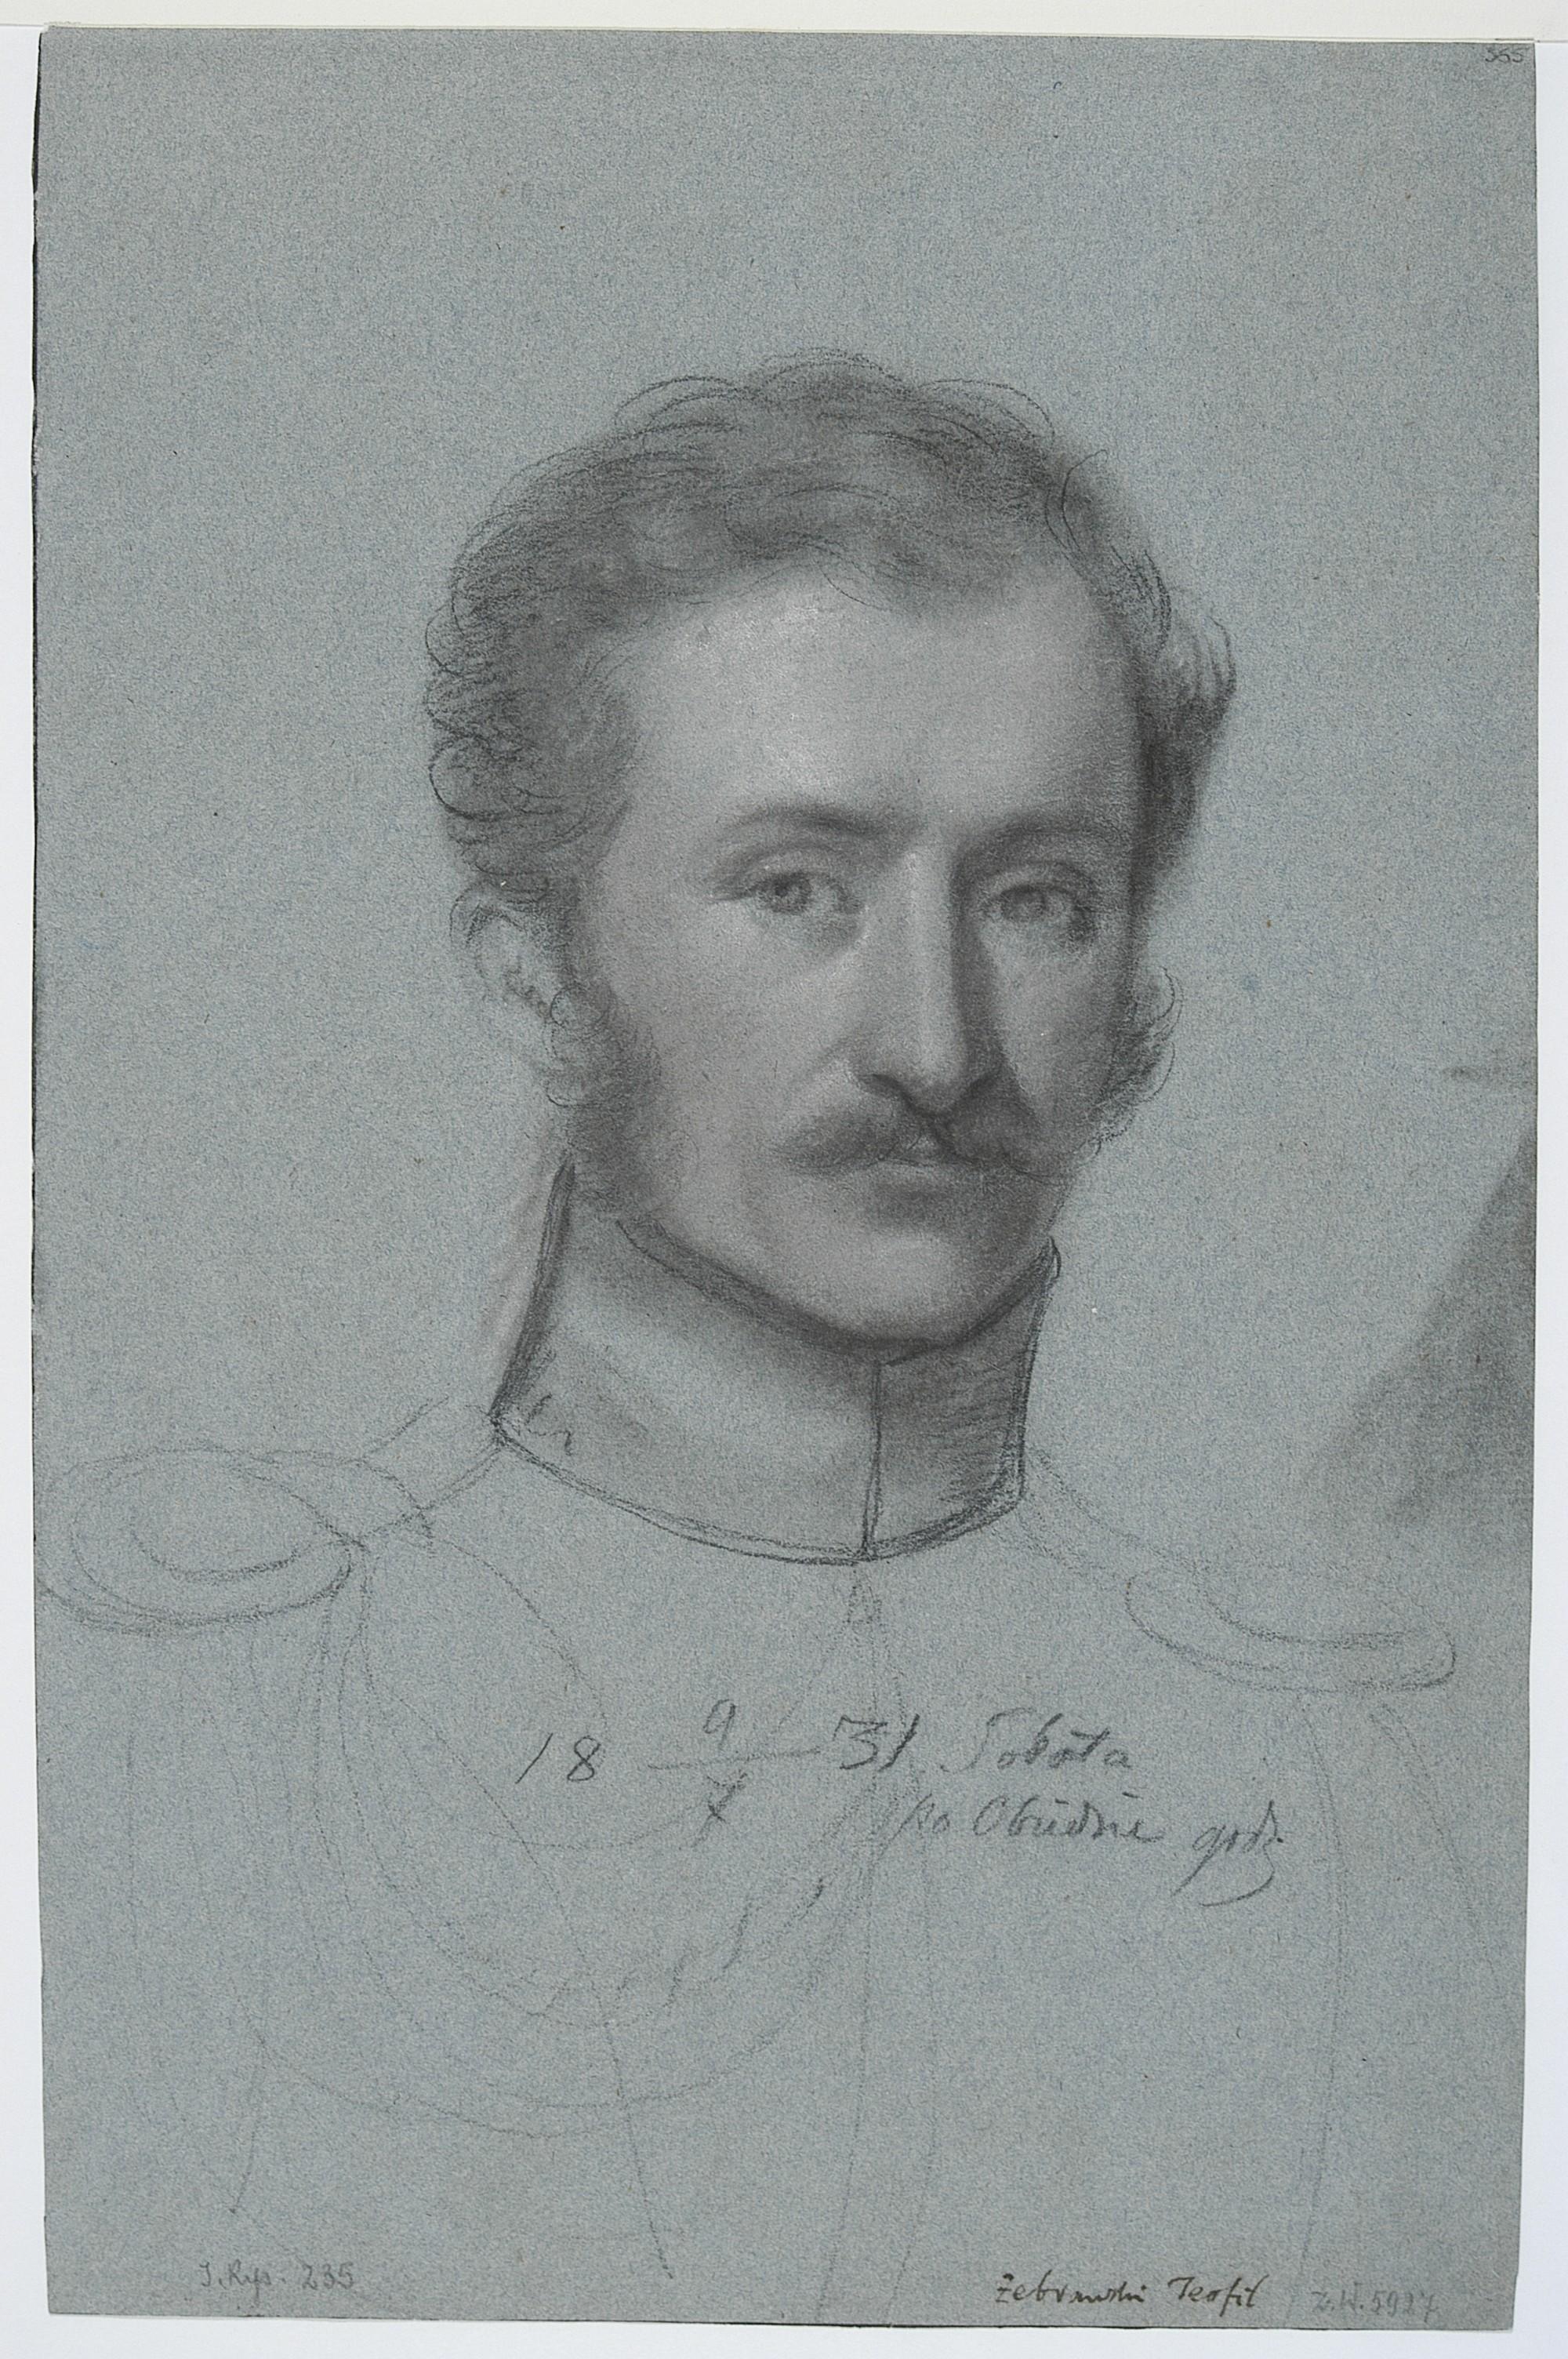 Teofil Żebrawski, self-portrait, 1830